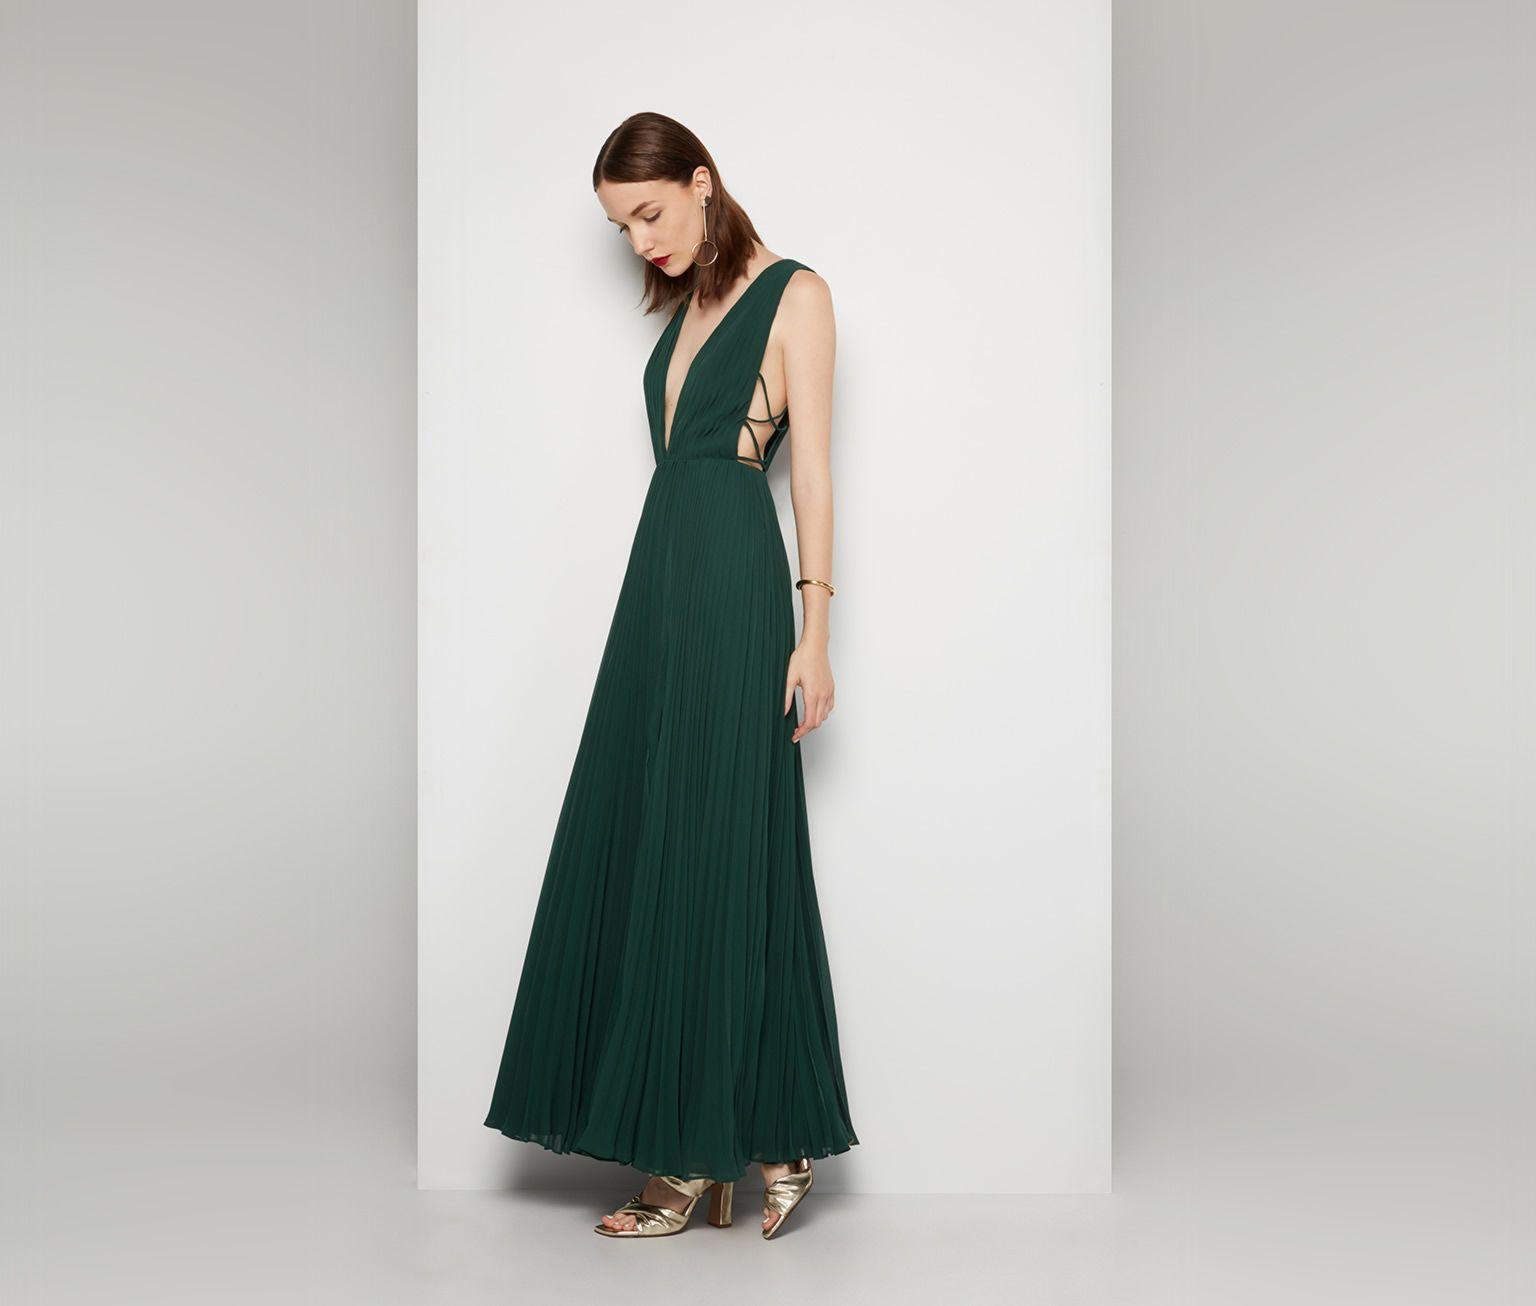 a0201e67304a Fame & Partners Allegra Dress | wedding dresses | Dresses, Green ...